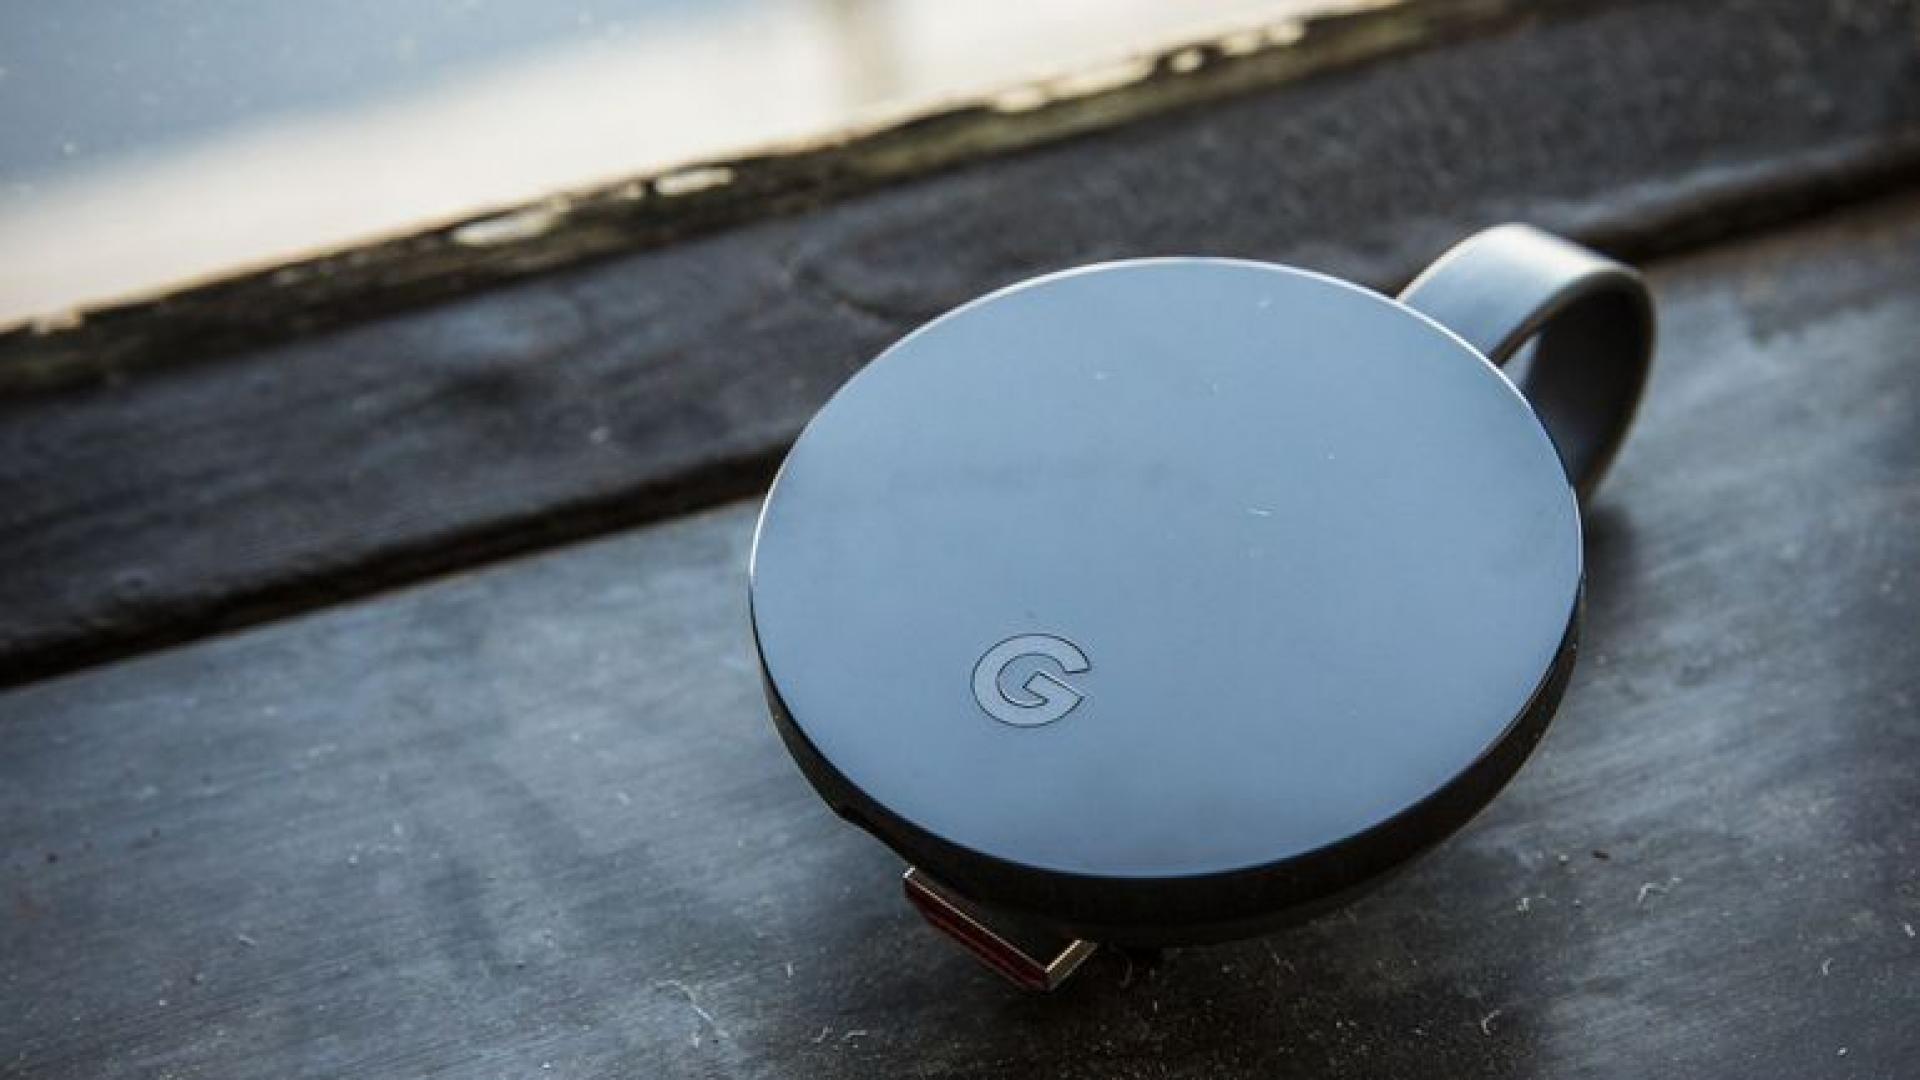 The New Google's Chromecast Ultra